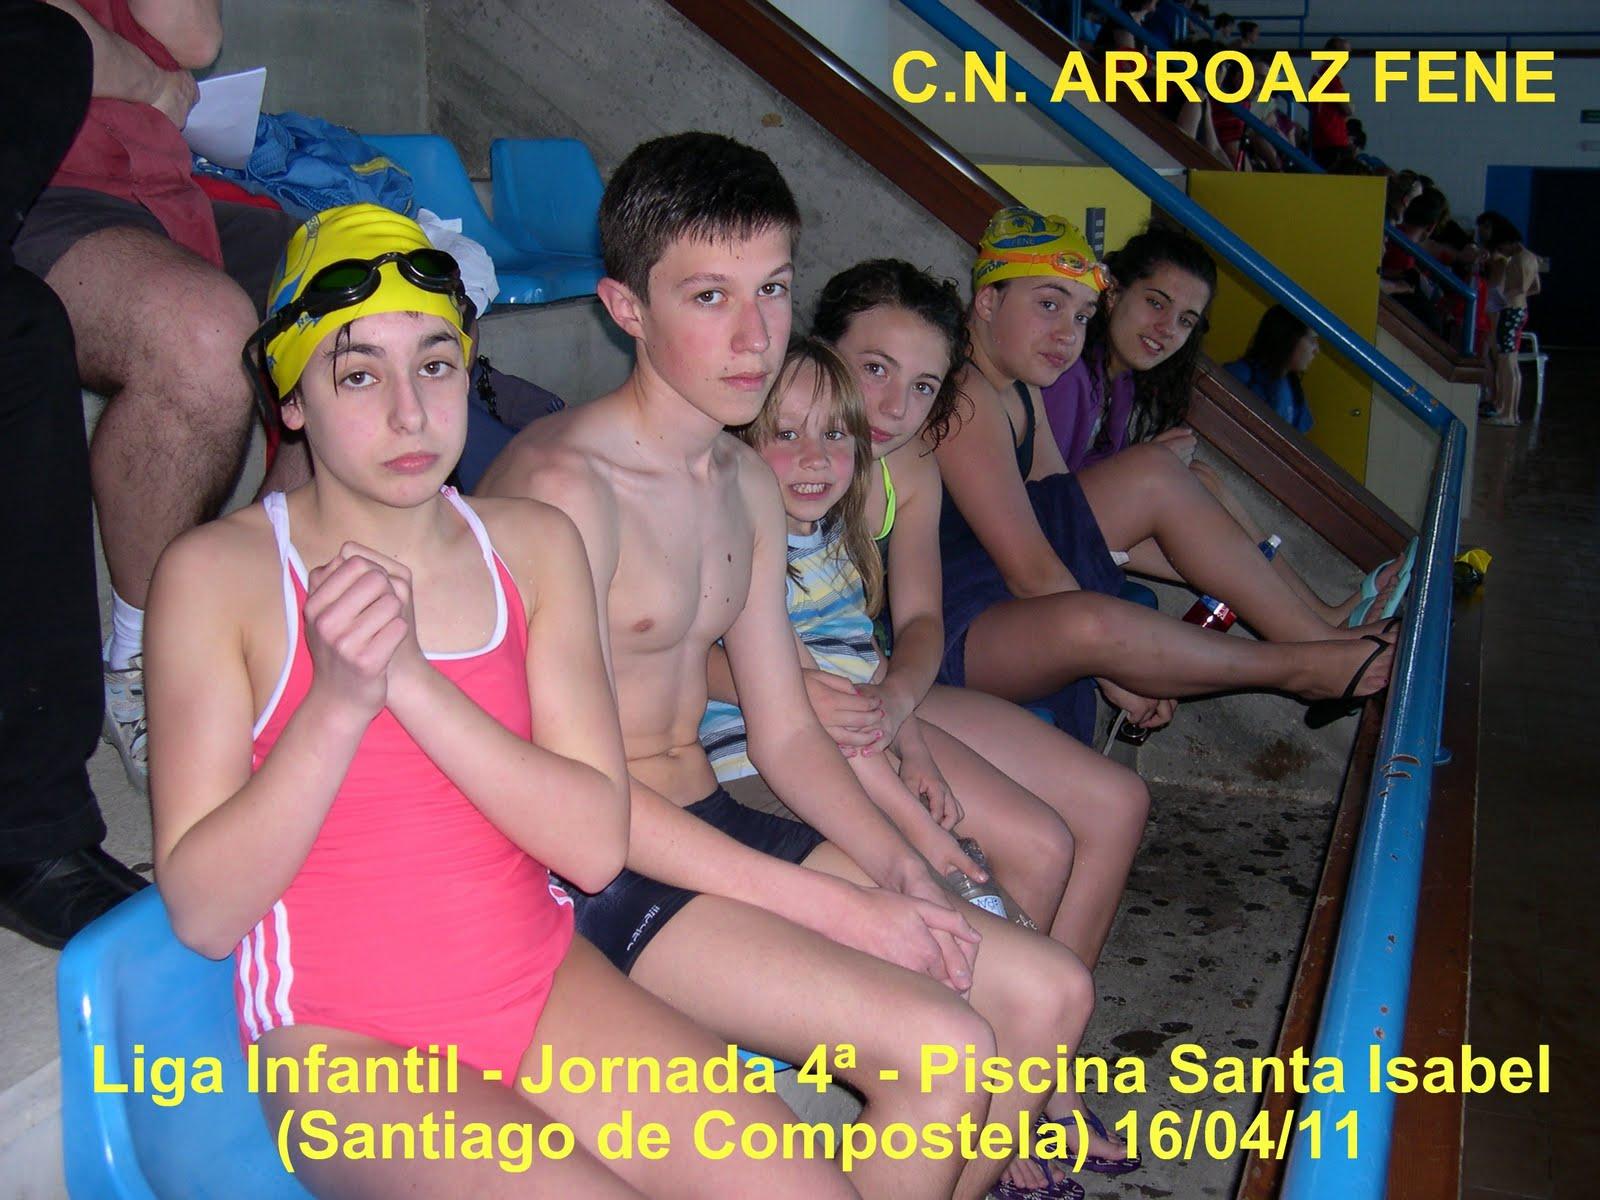 Club nataci n arroaz fene liga infantil jornada 4 - Piscina santiago de compostela ...